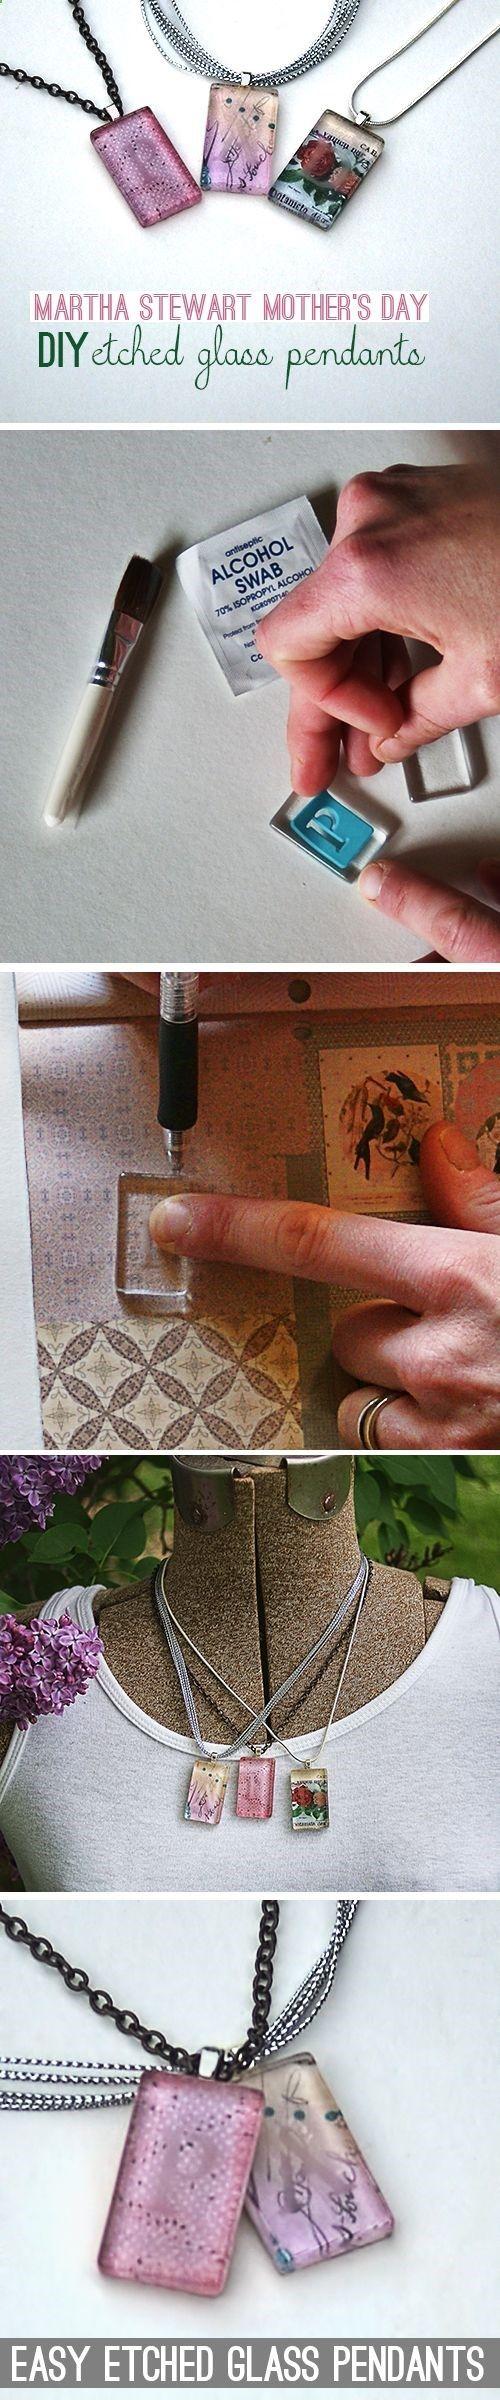 @savedbyloves DIY Etched Glass Tile Pendant